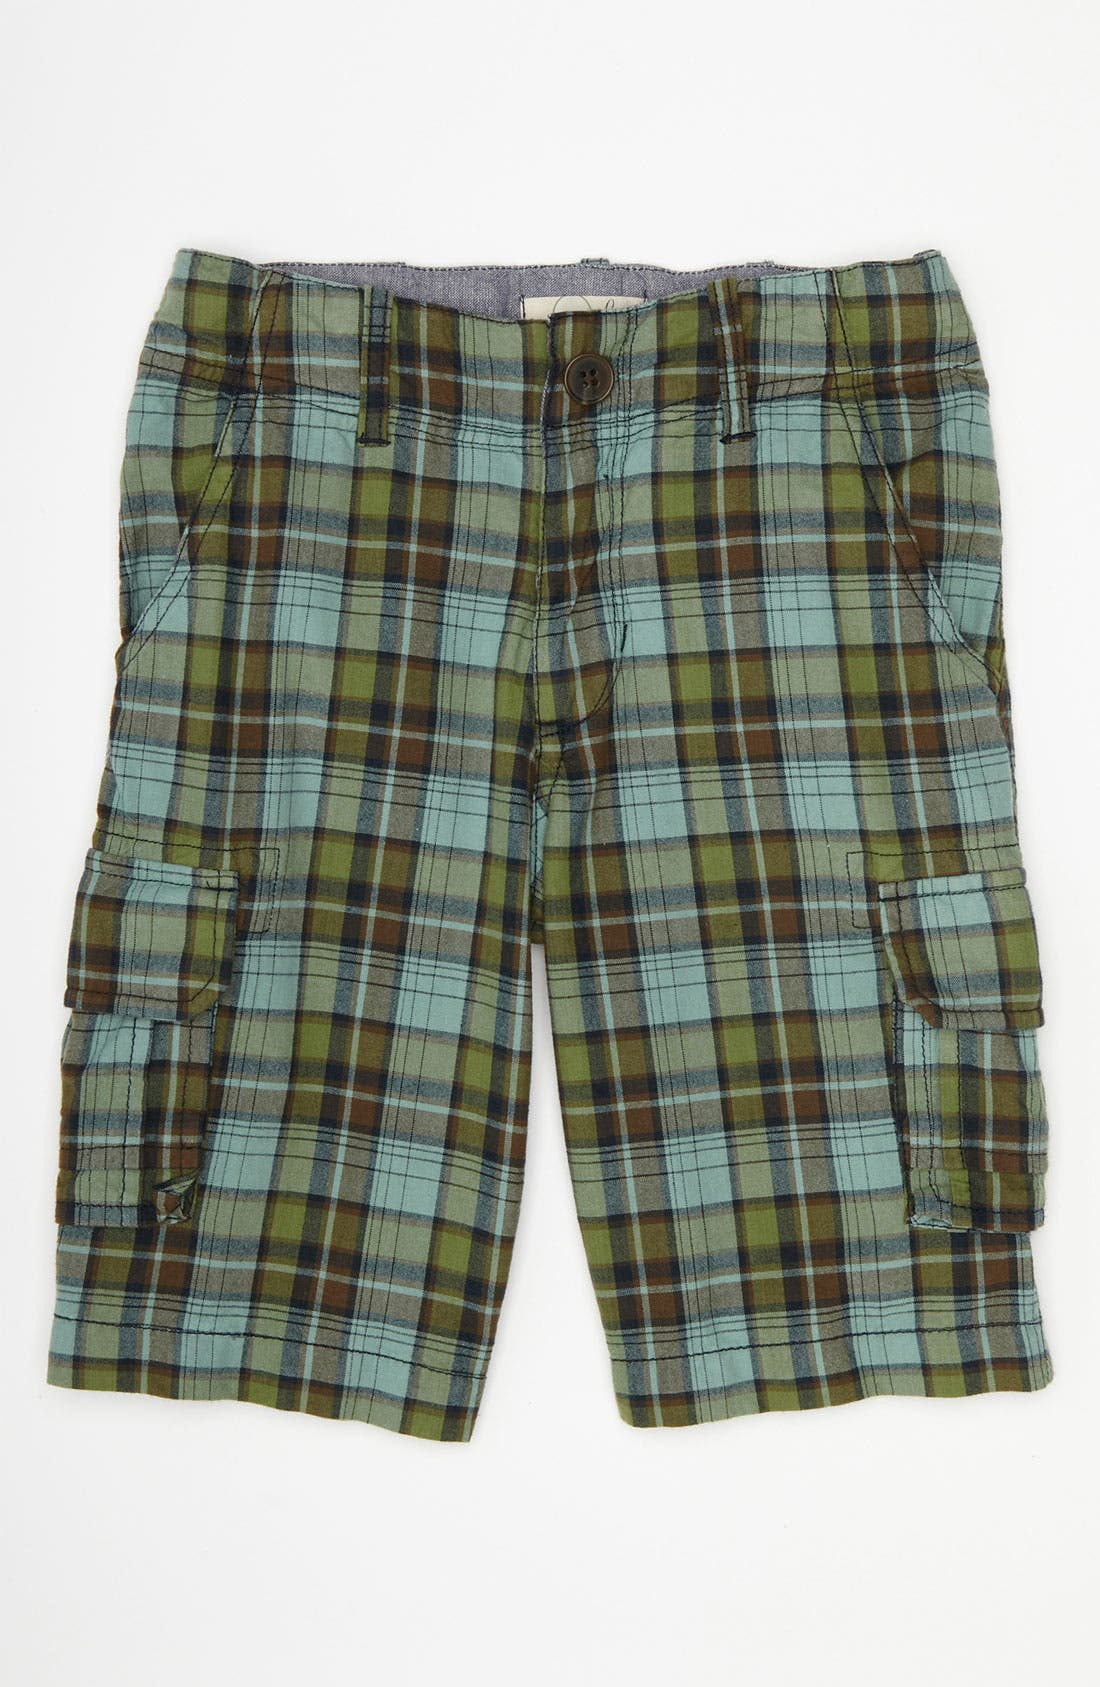 Alternate Image 1 Selected - Peek 'Havasu' Trail Shorts (Toddler, Little Boys & Big Boys)